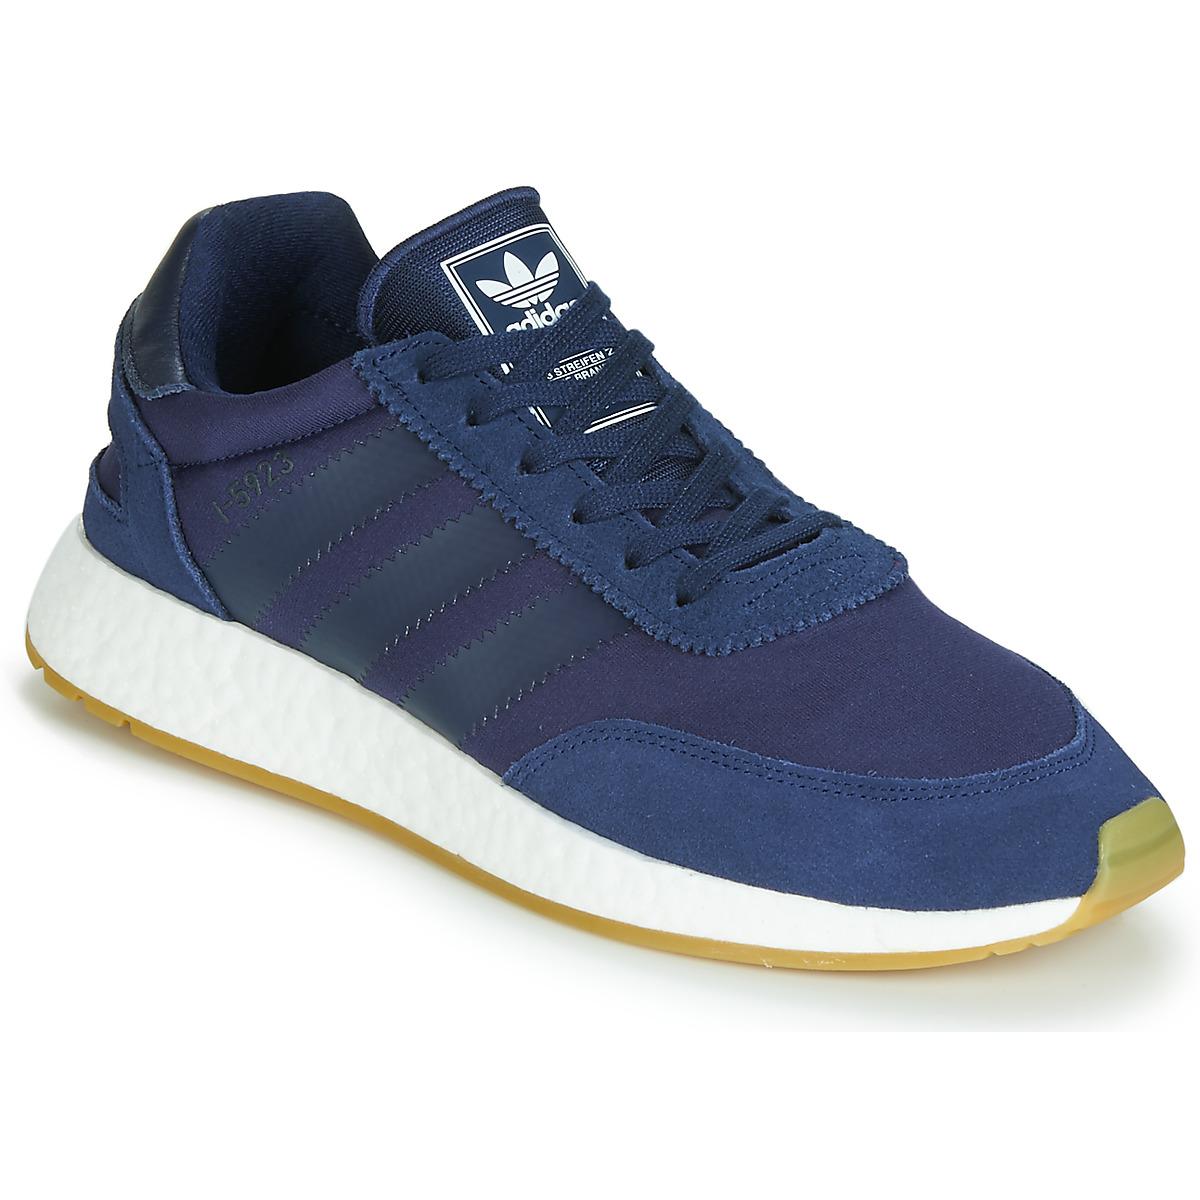 adidas scarpe uomo i5923